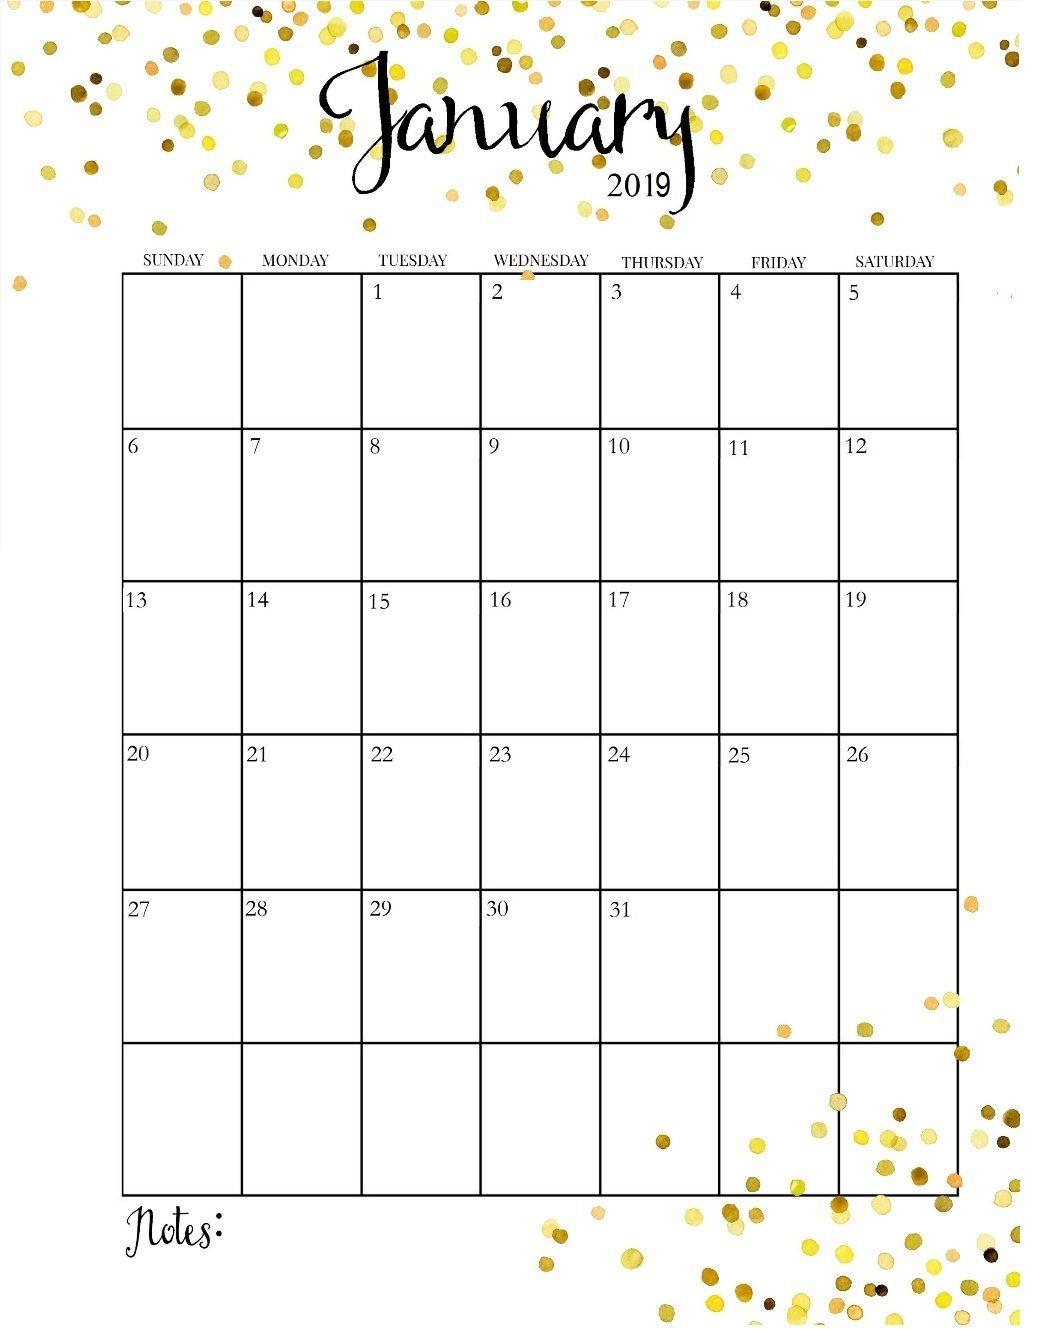 January 2019 Meal Calendar Cute January 2019 Calendar | calender | Календарь, Печатные